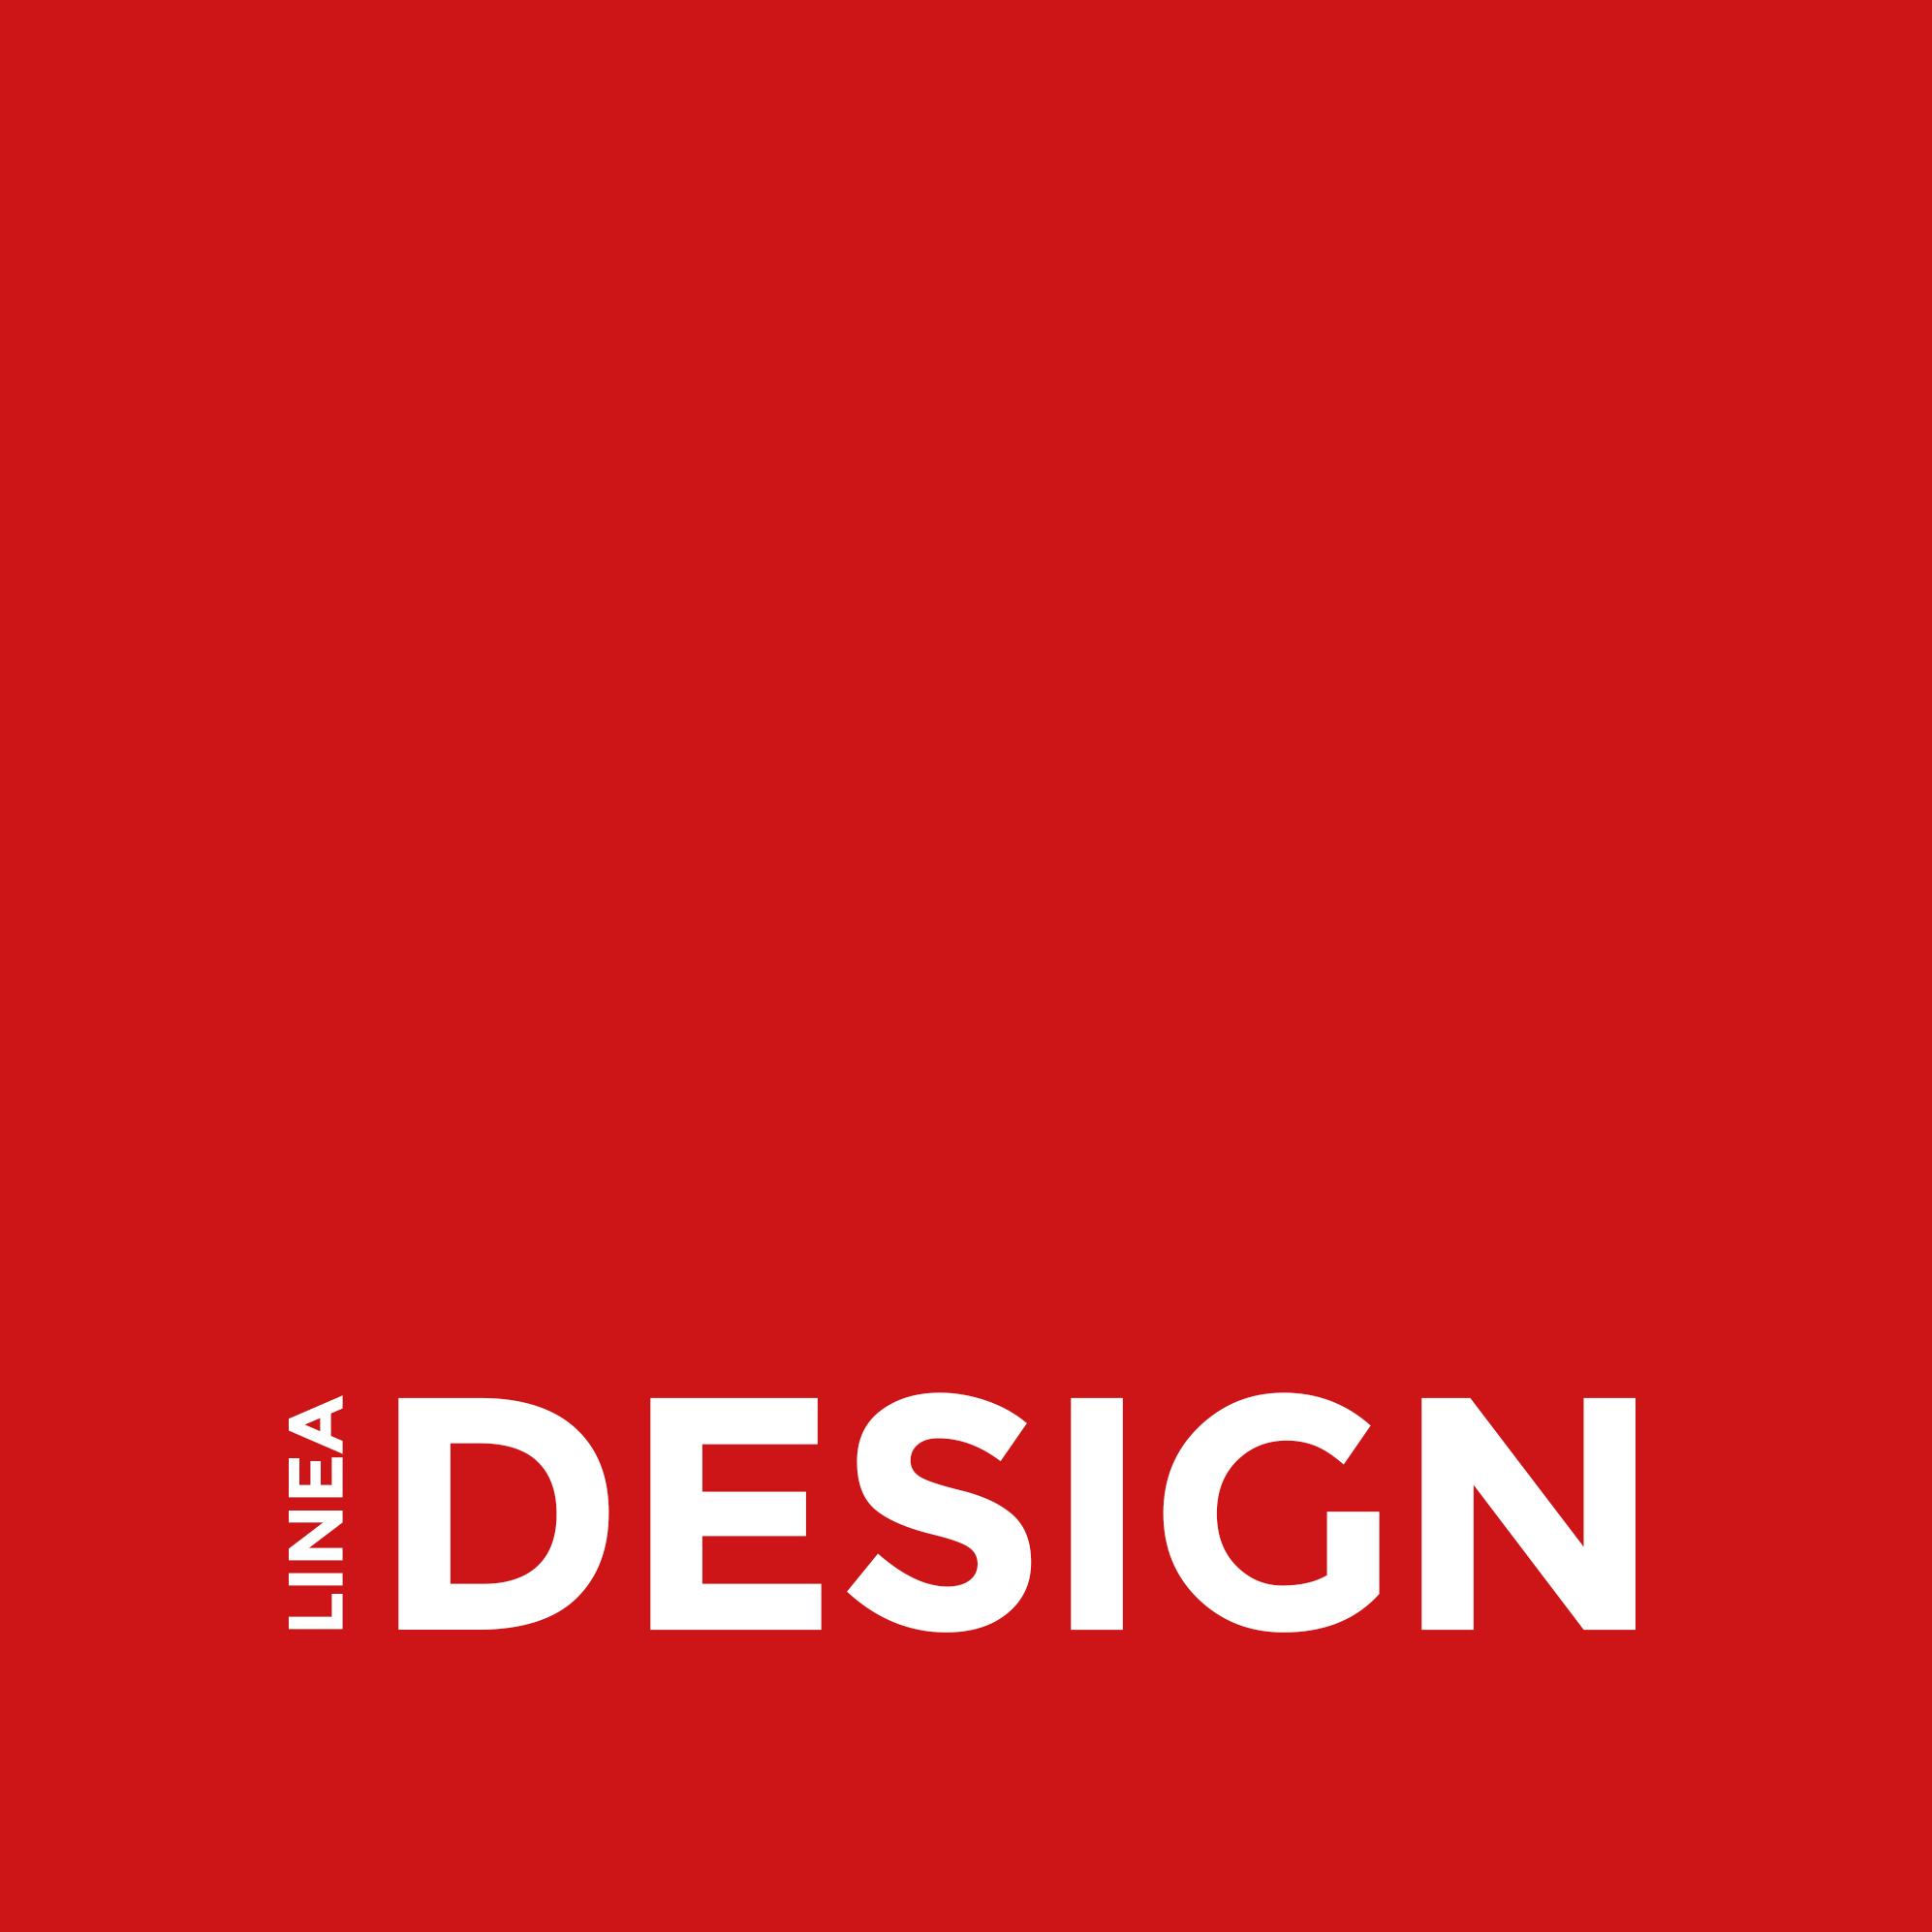 promo-banner-image